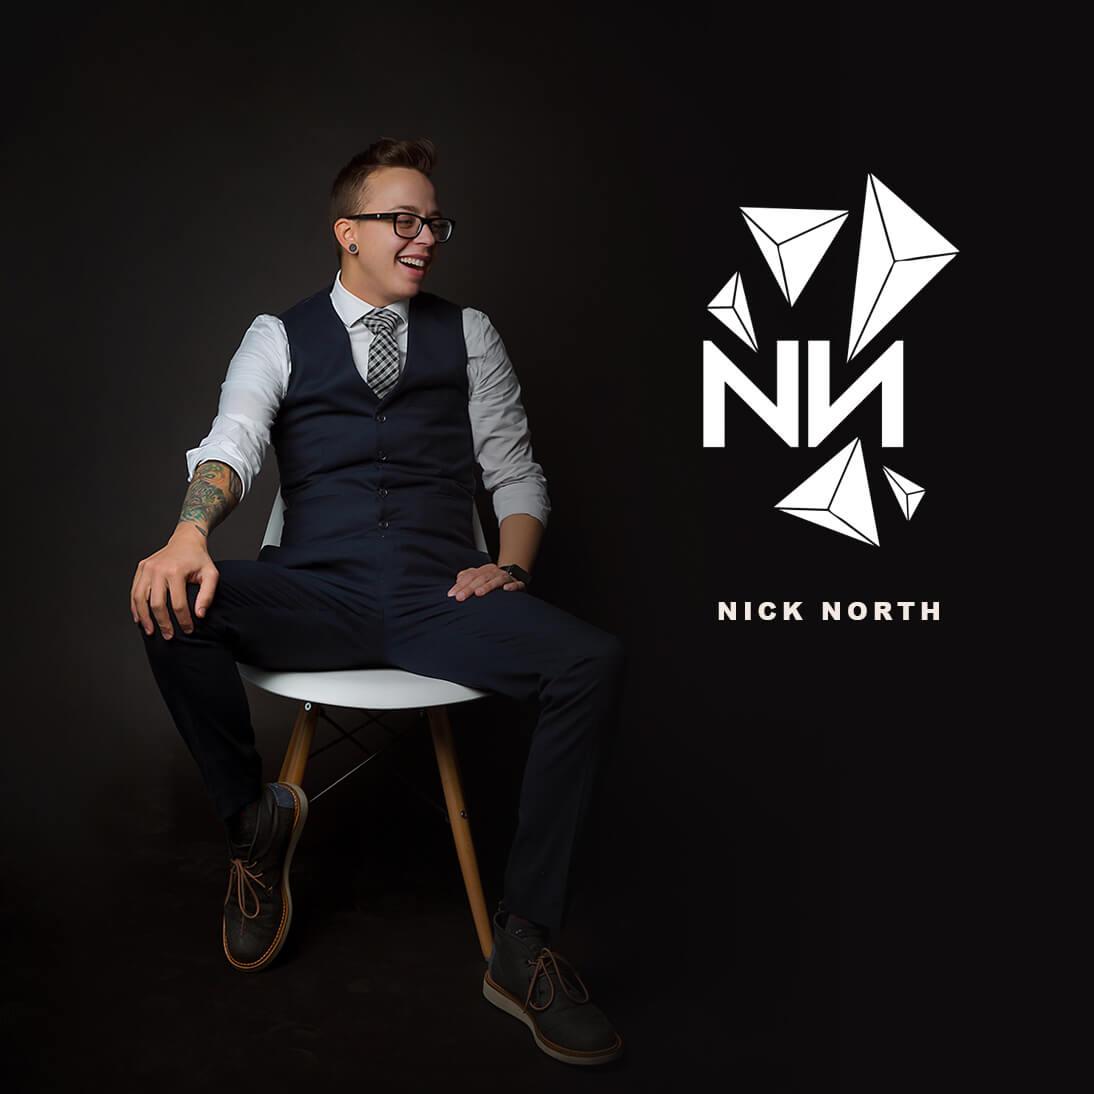 nick-north-website.jpg